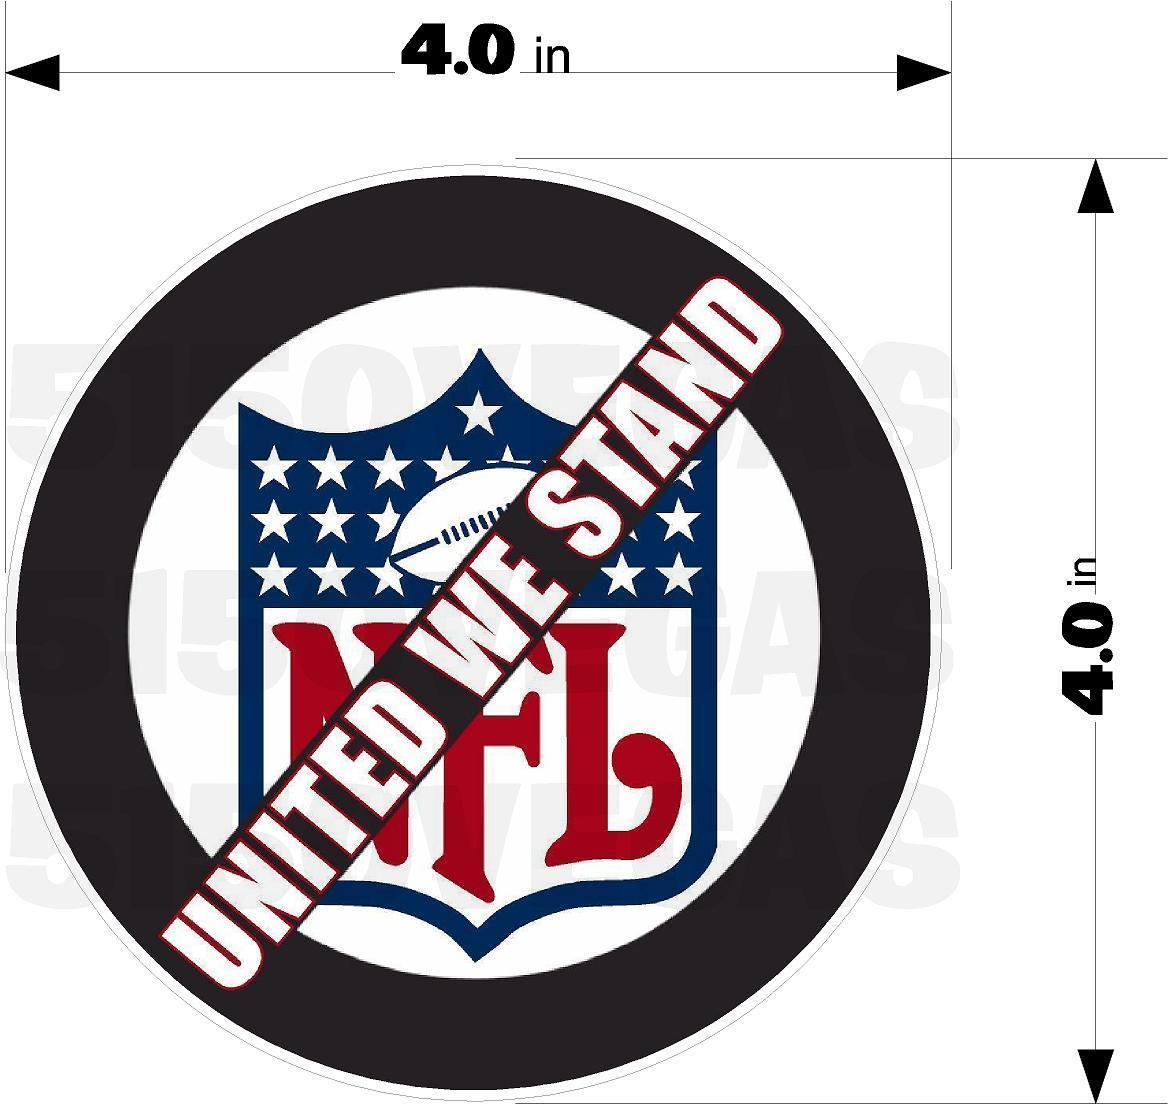 Fu*k Gun Control Sticker Vinyl Decal 2nd Amendment Car Truck Window